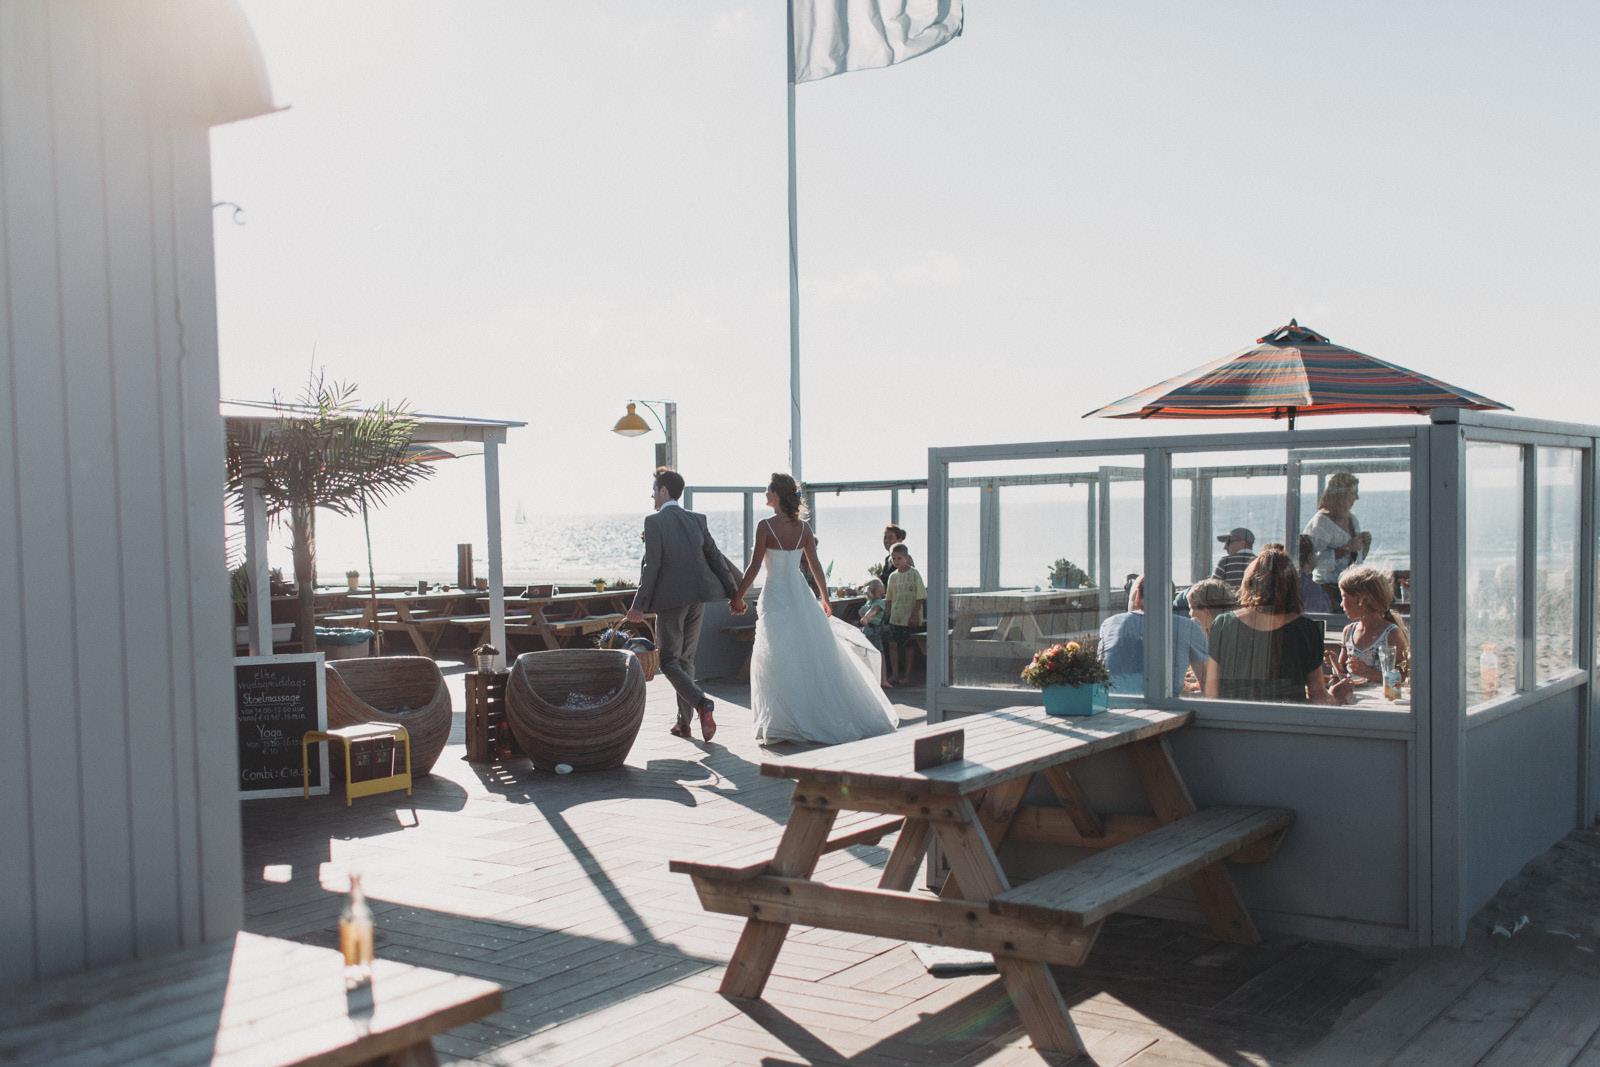 Evabloem_trouwen-sint-joris-doele_strandpaviljoen-zuid-69.jpg